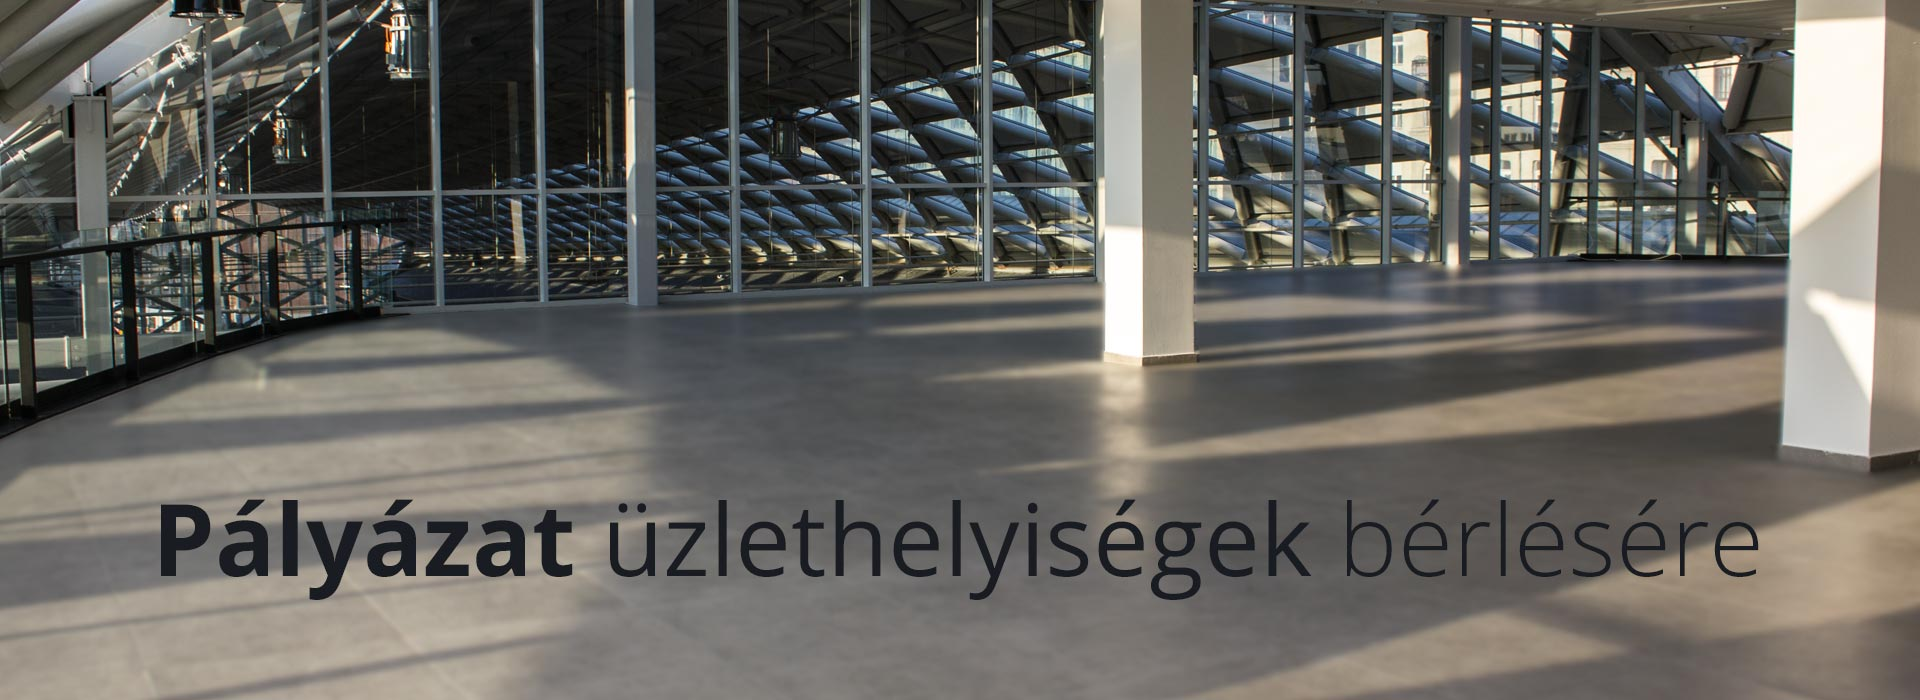 2014-palyazat-berles-slider1920_5